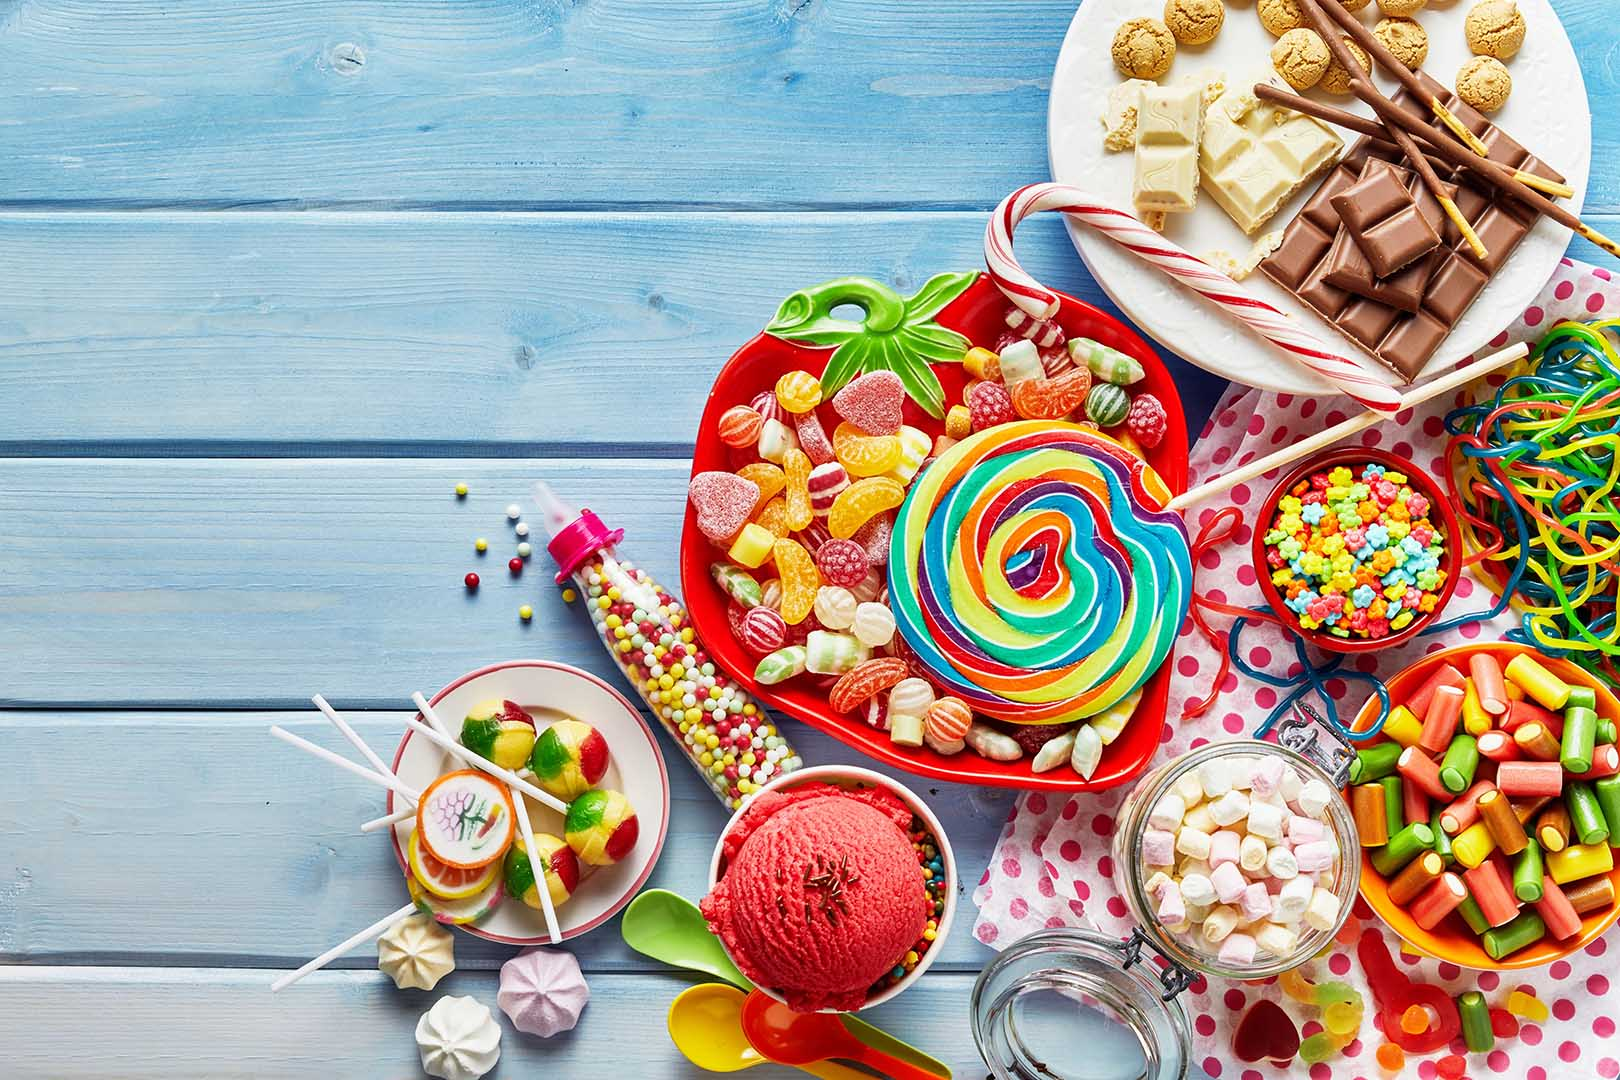 7 Penyebab Diabetes yang Dari Kebiasaan Sehari-Hari